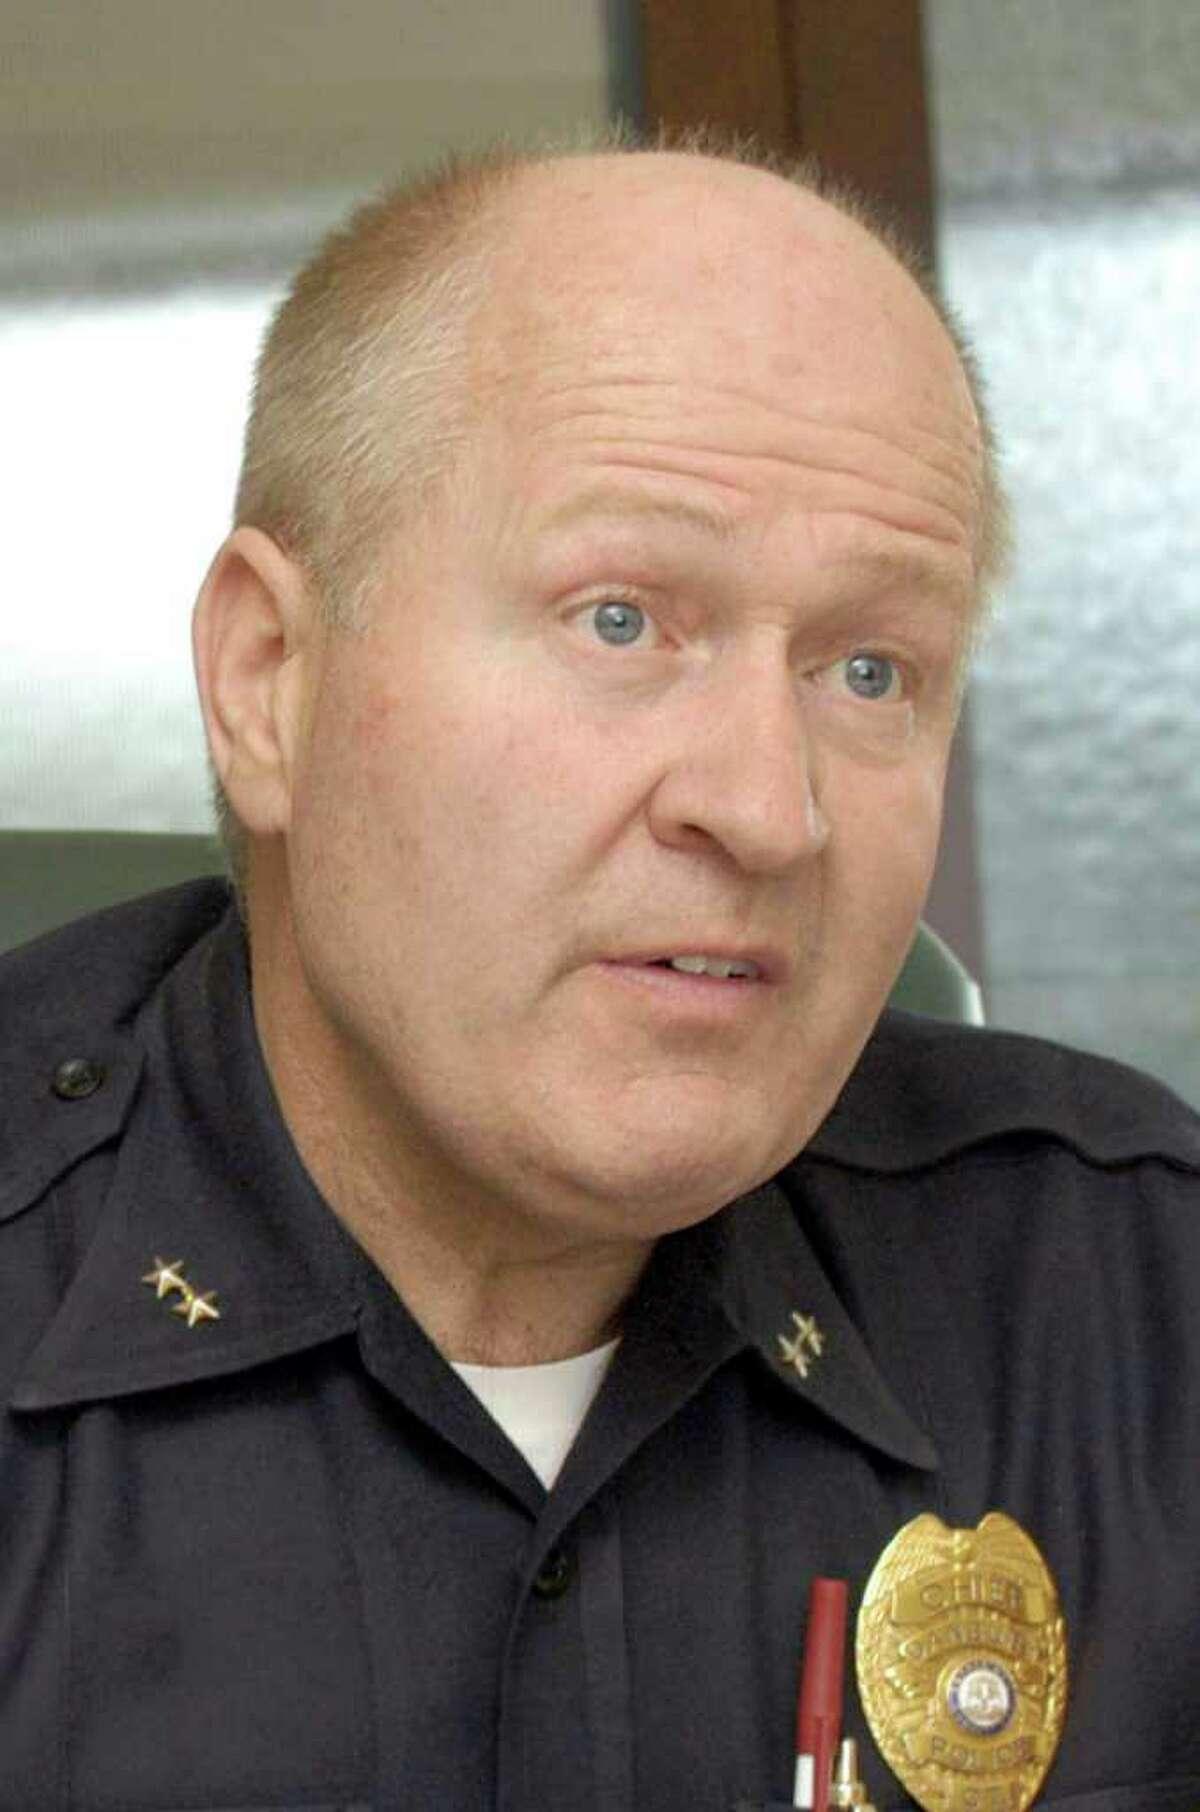 Danbury Police Chief Al Baker